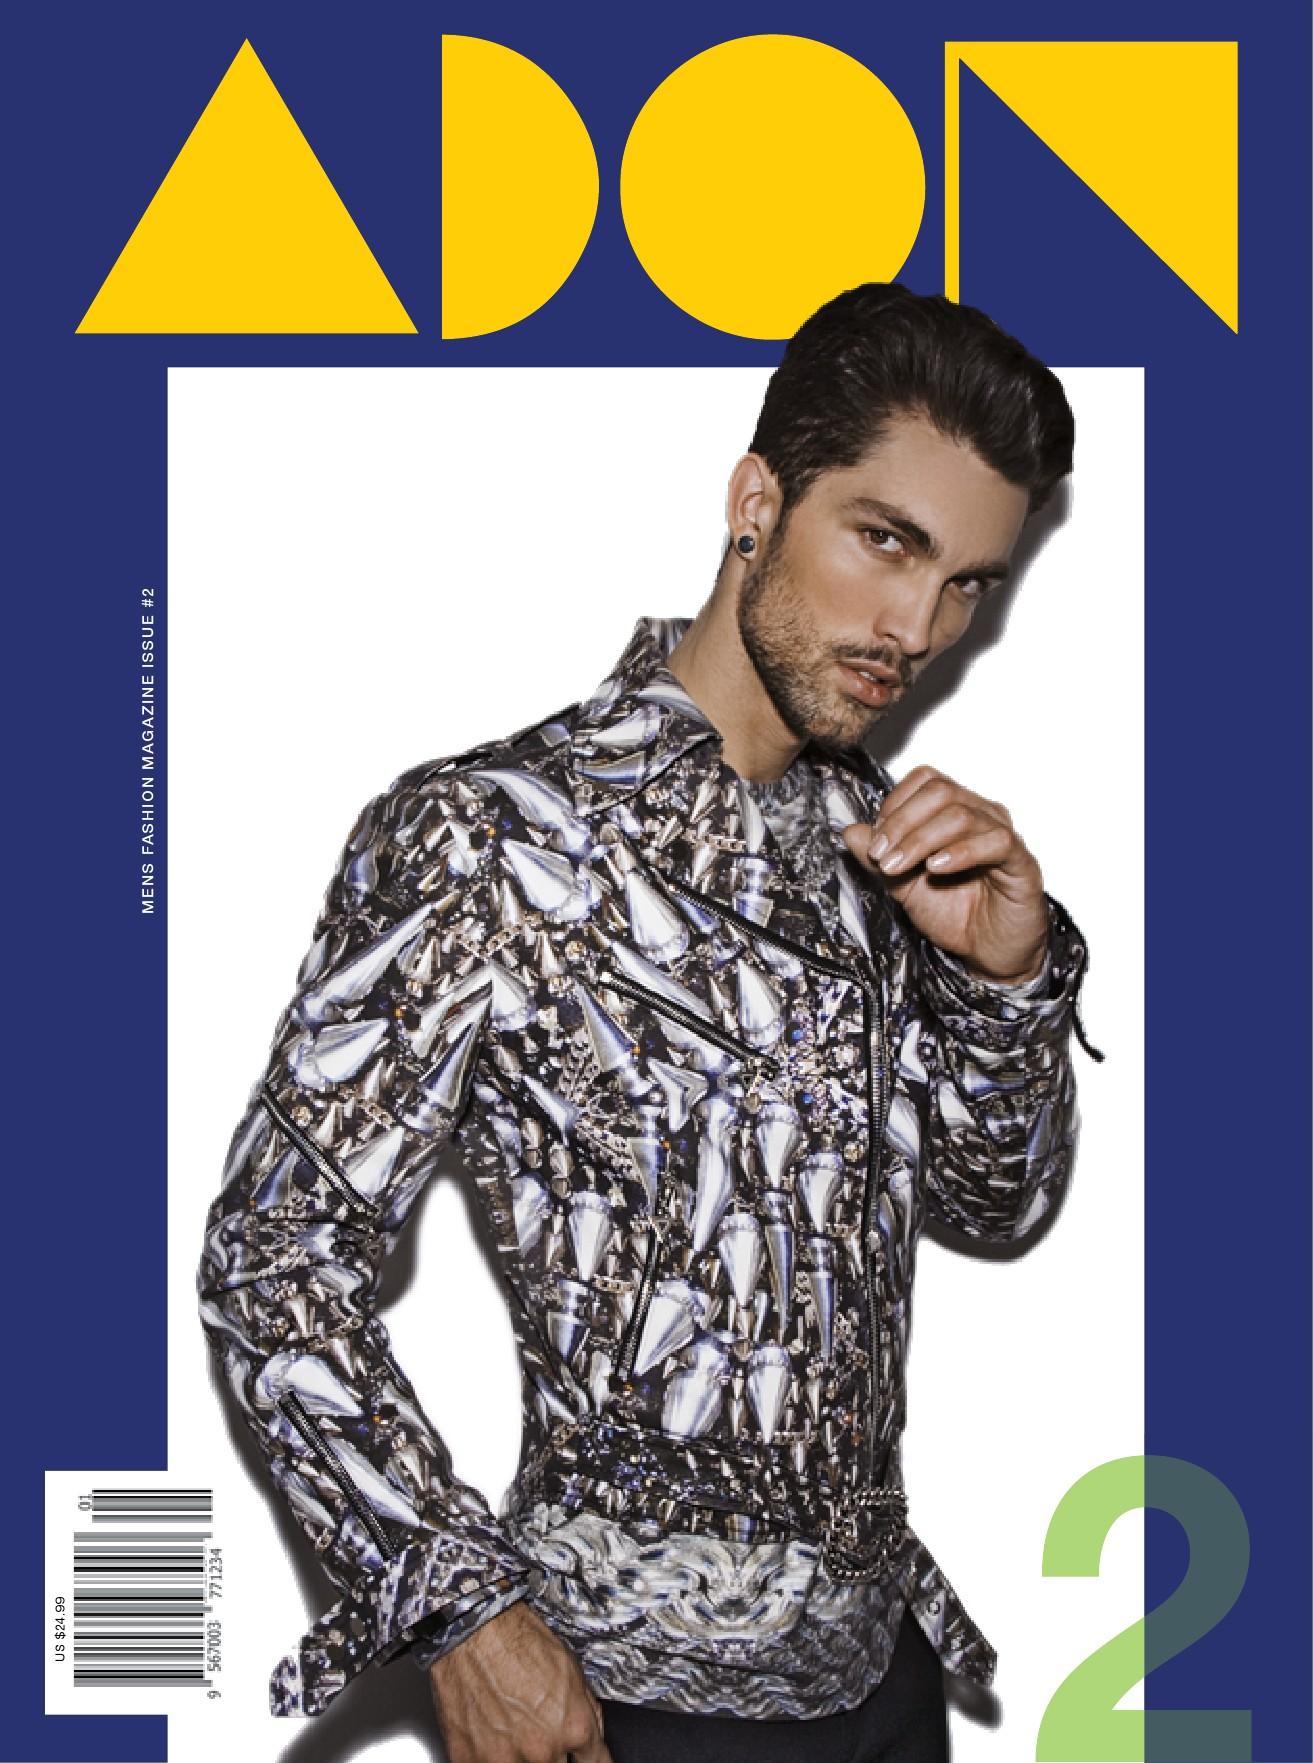 Tobias-Sorensen-ADON-Magazine-Issue2-Rck-Day-Roy-Fire-2013.jpg